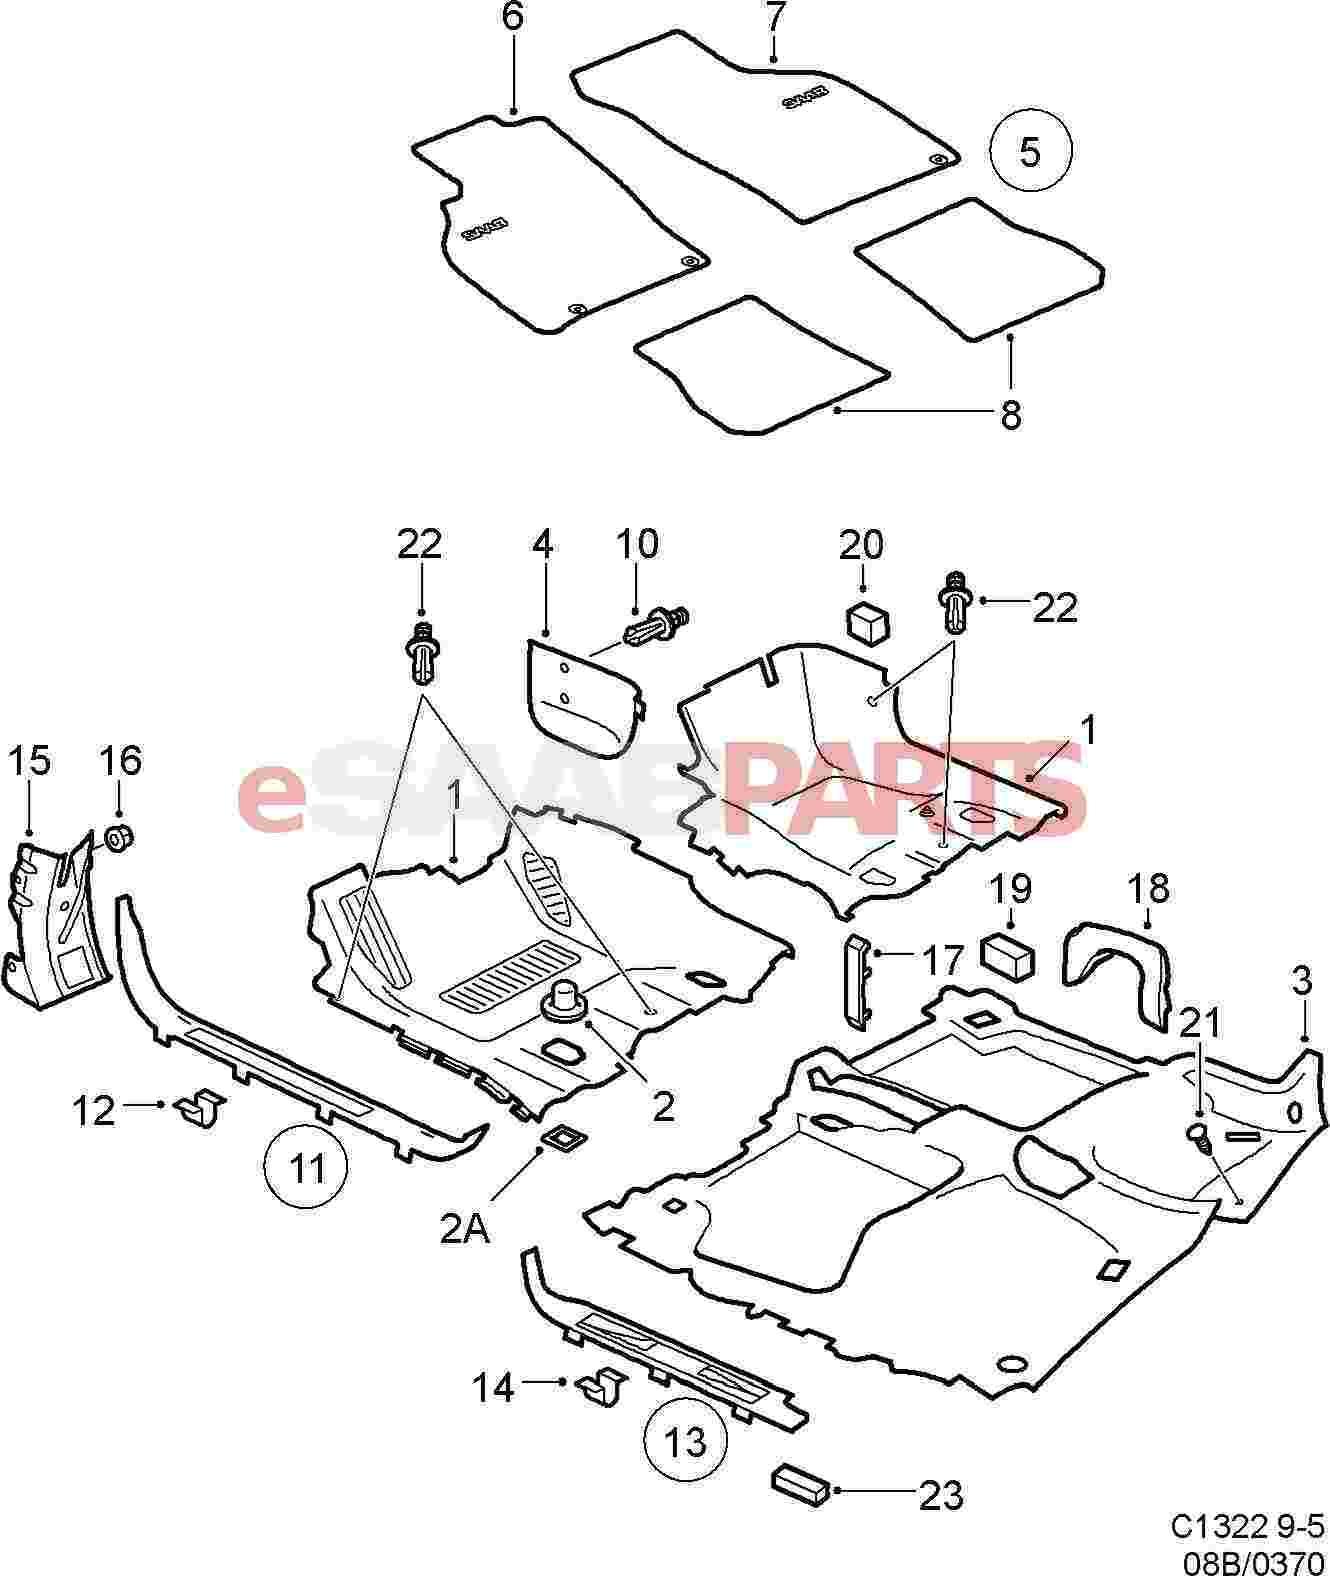 Astrostart Wiring Harness Auto Electrical Diagram Saab 9 5 Towbar Astroflex Diagrams Honda